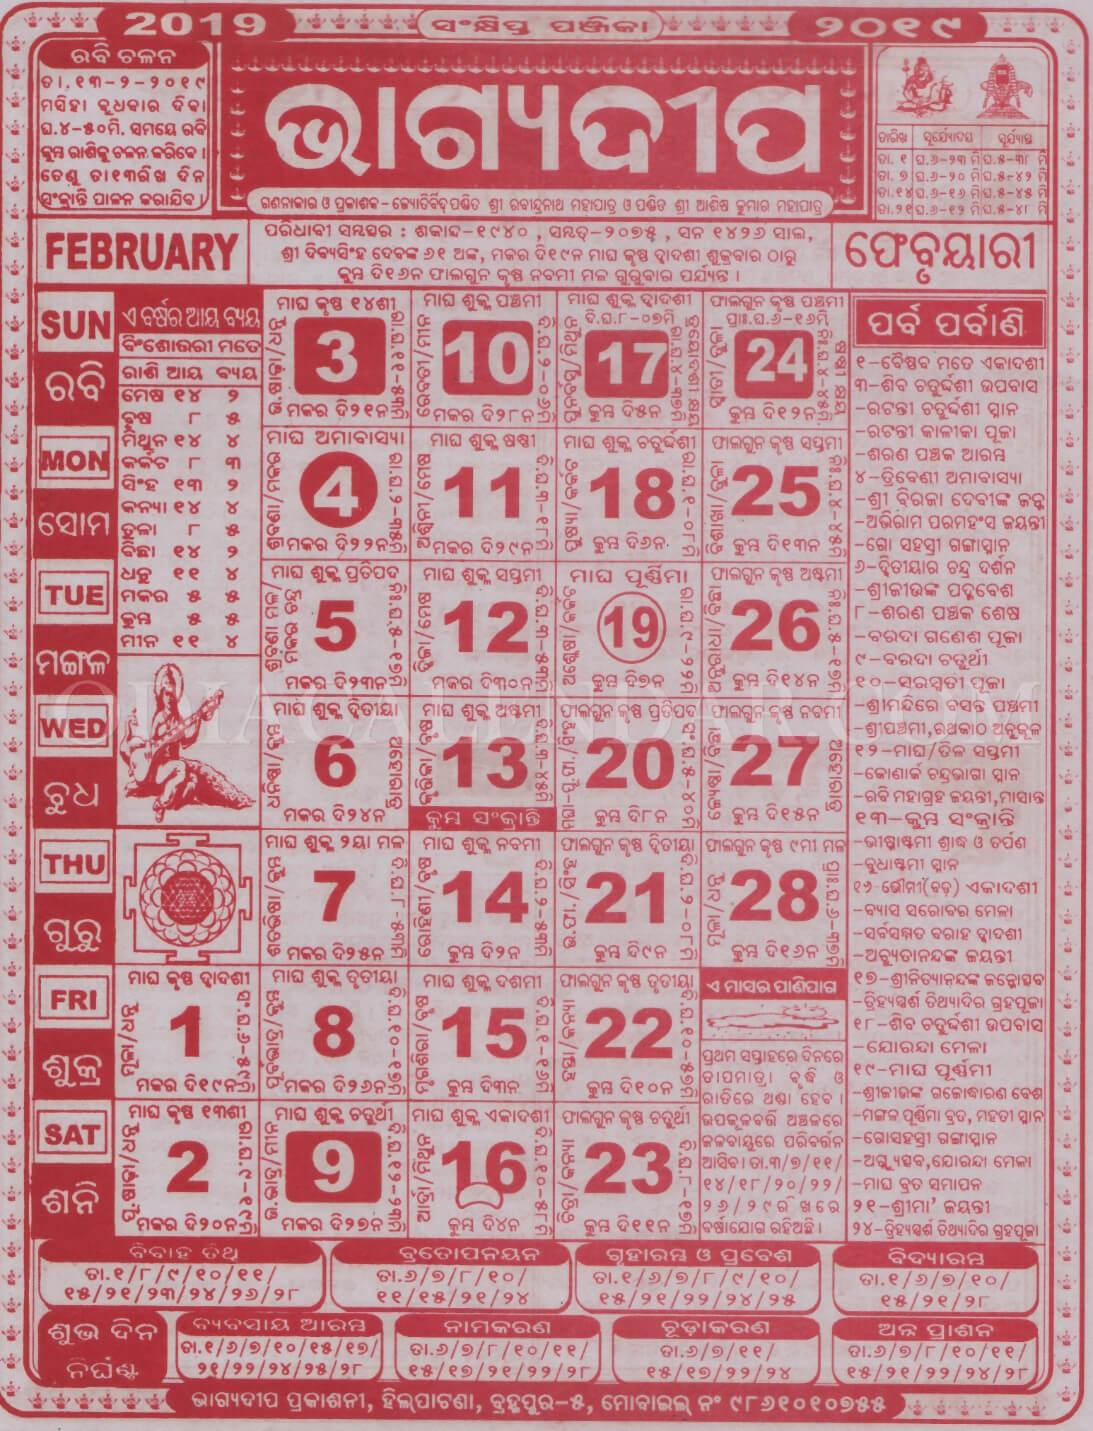 Odia Bhagyadeep Calendar 2020 February View And Download Free with Bhagyadeep Odia Calendar 2020